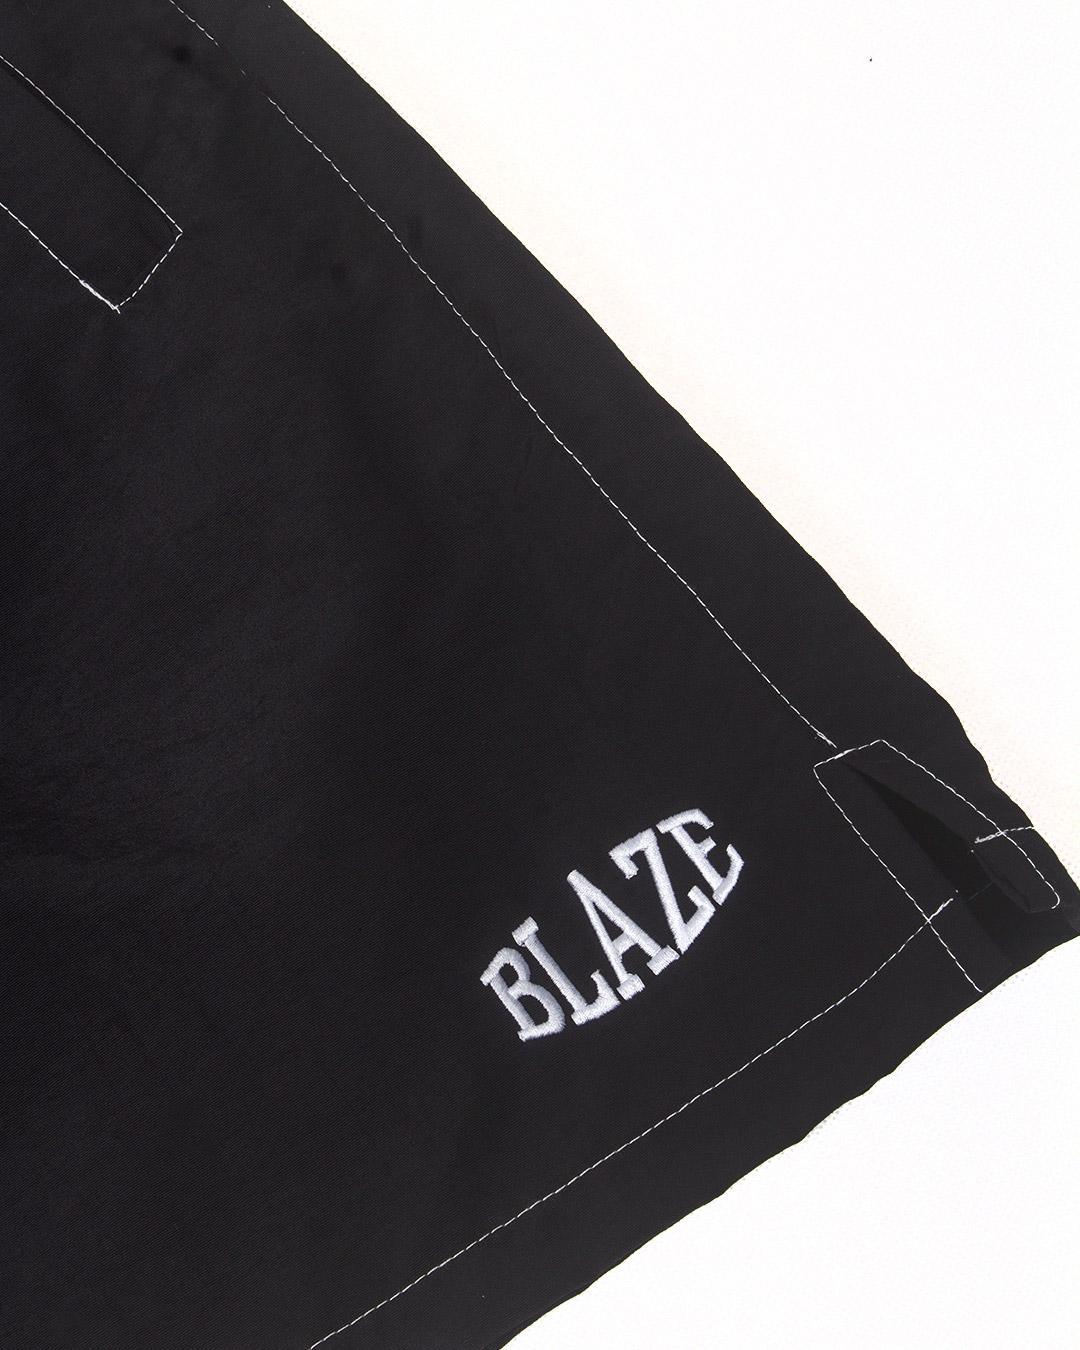 Bermuda Compact Black Blaze Supply